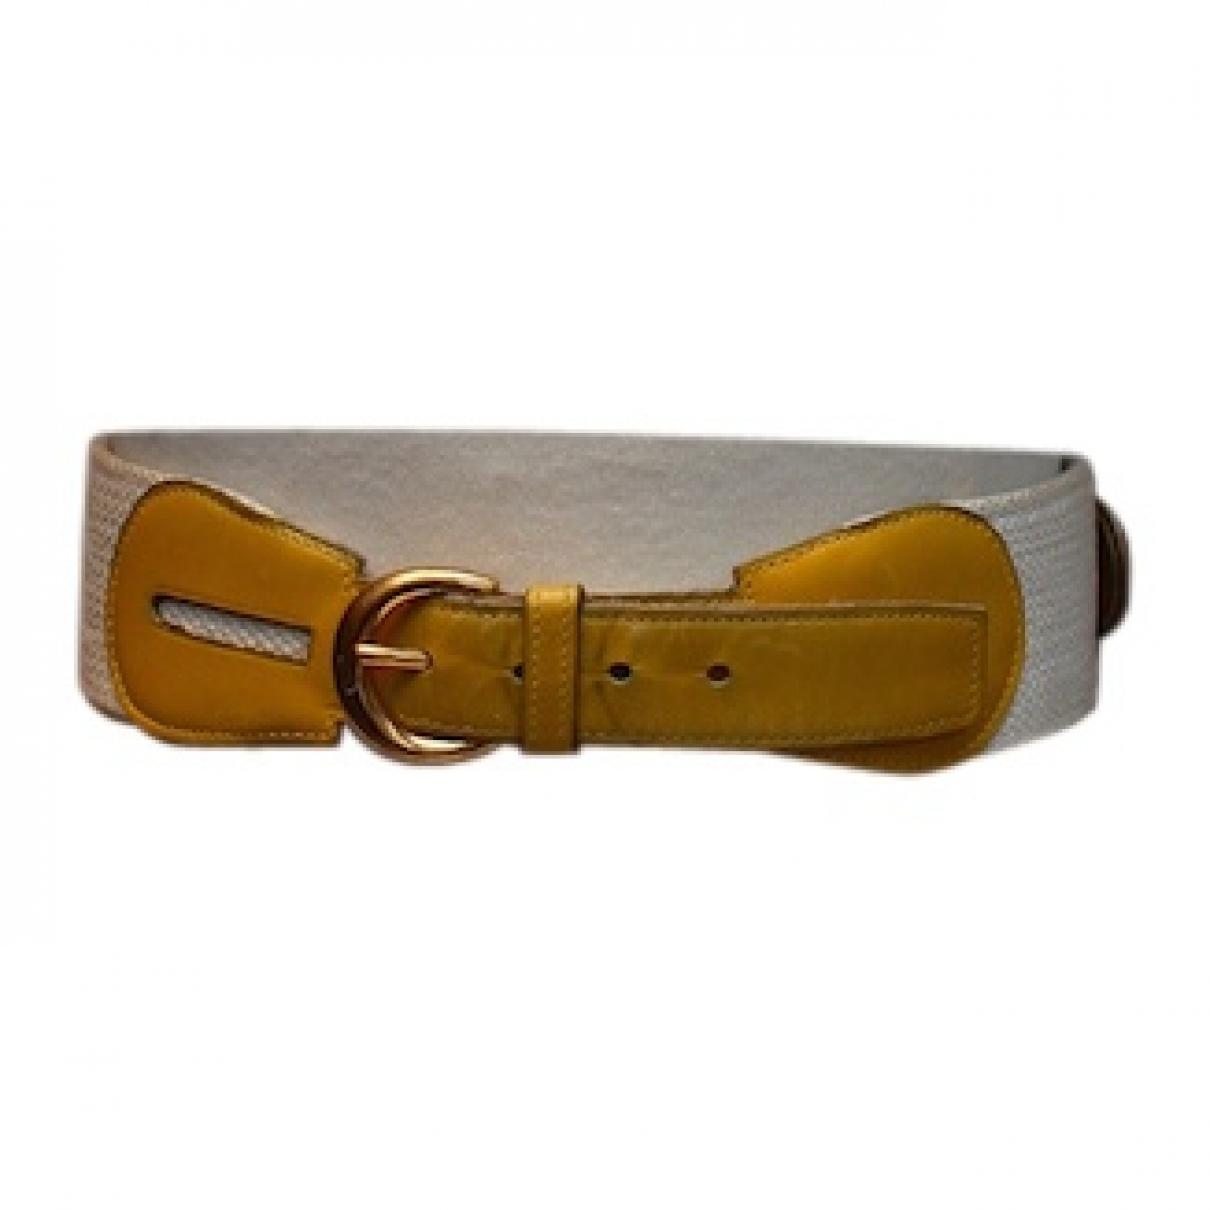 Cinturon de Lona Hermes